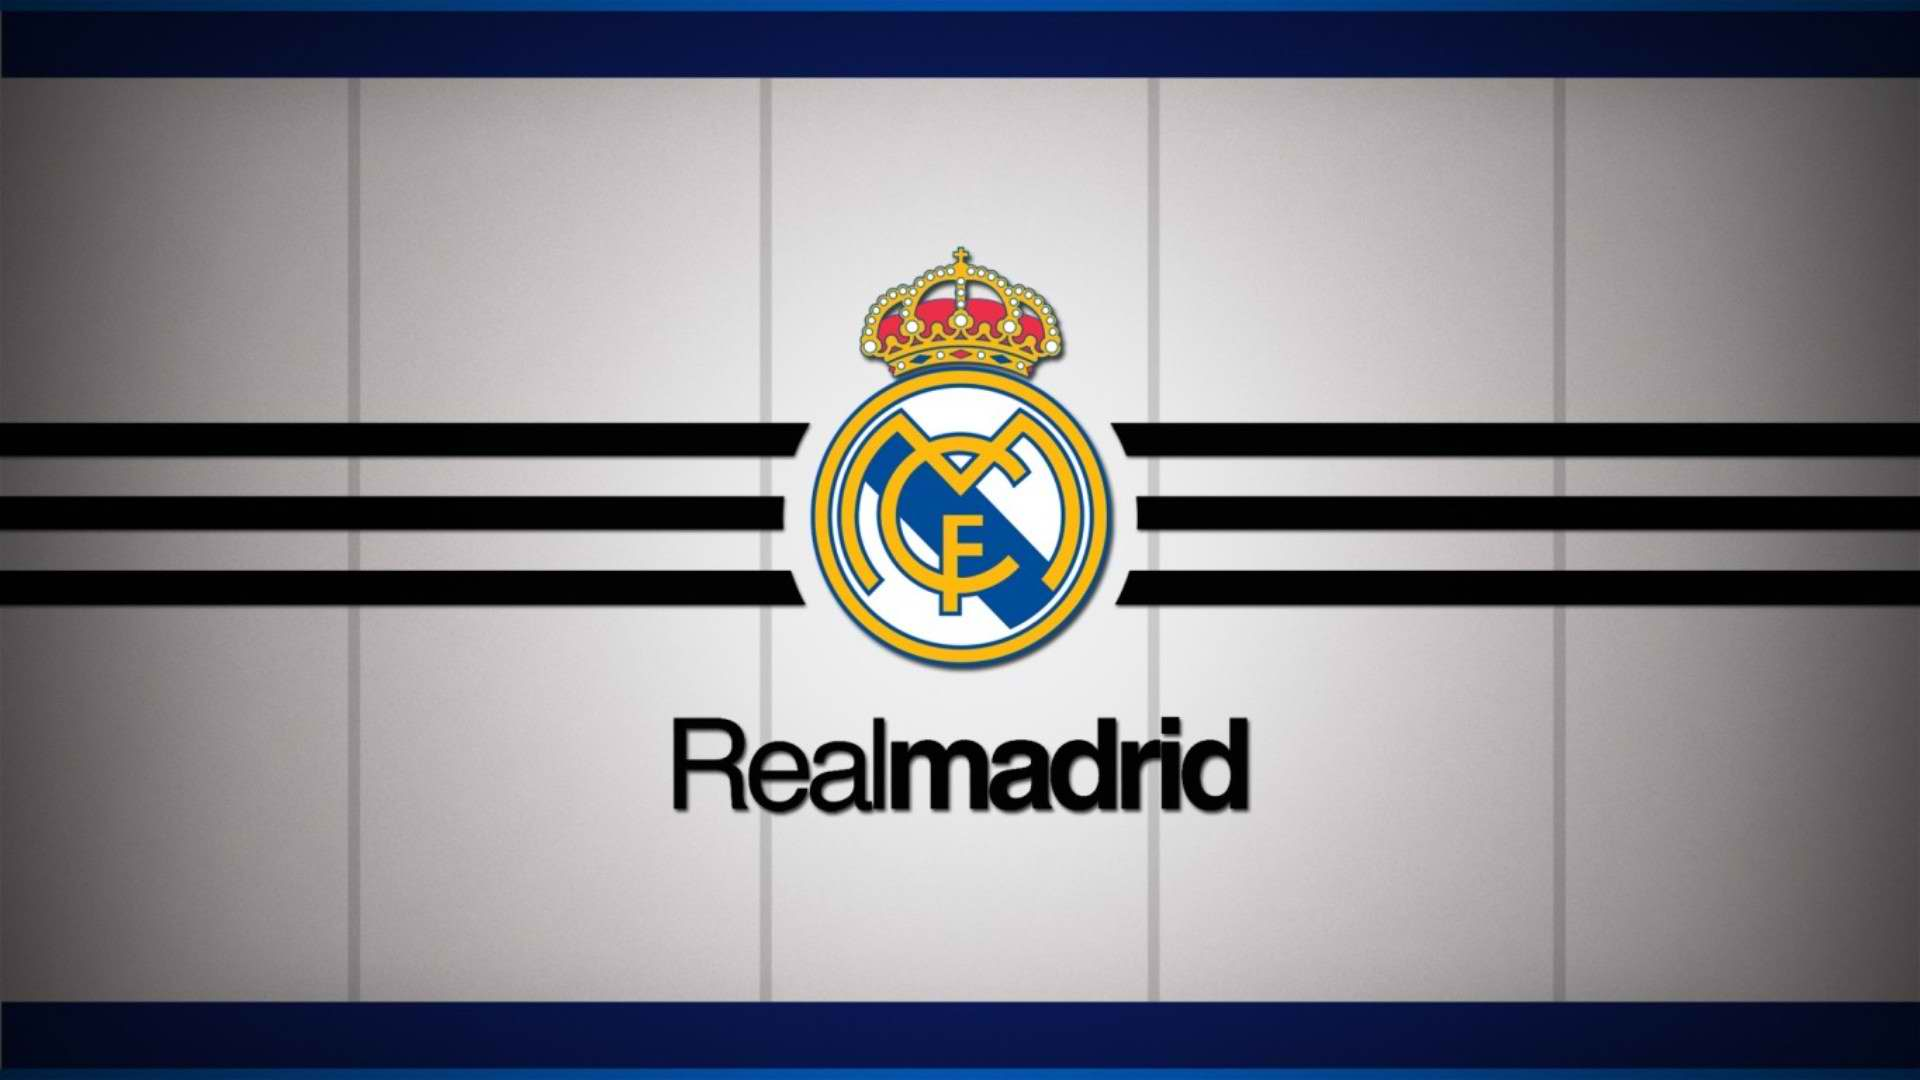 Real Madrid Logo Wallpapers 2015 HD 1920x1080